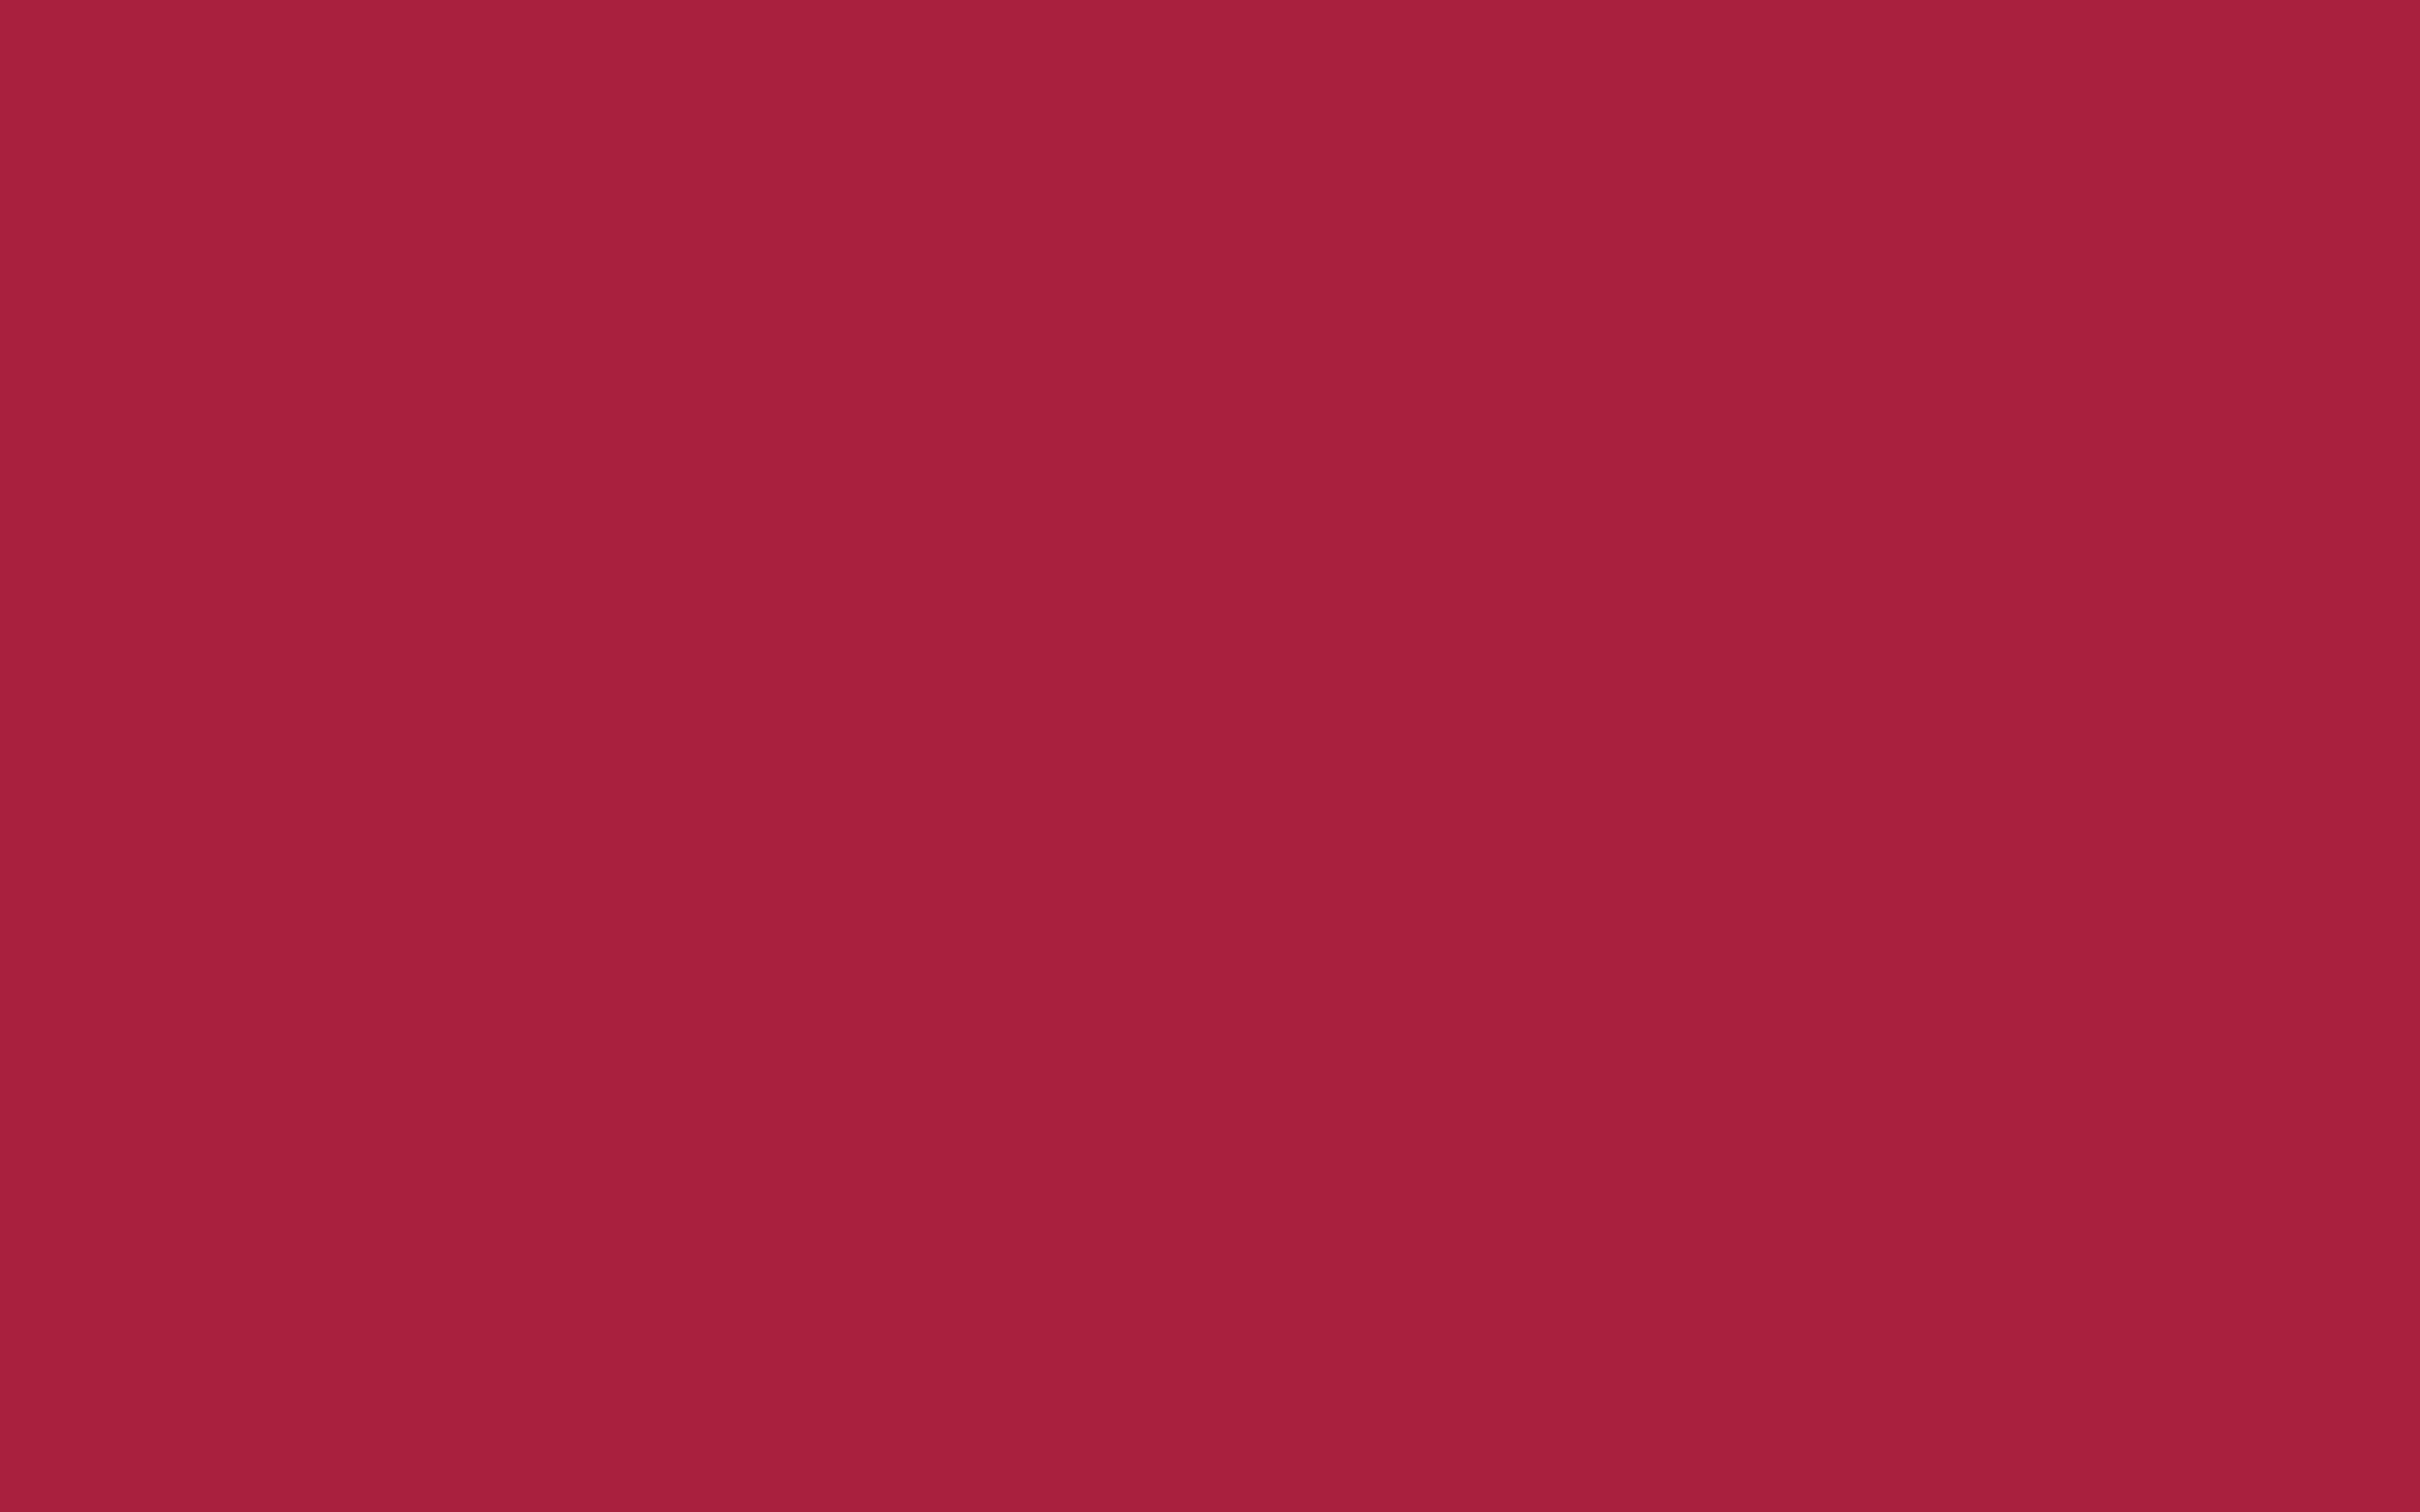 2560x1600 Deep Carmine Solid Color Background